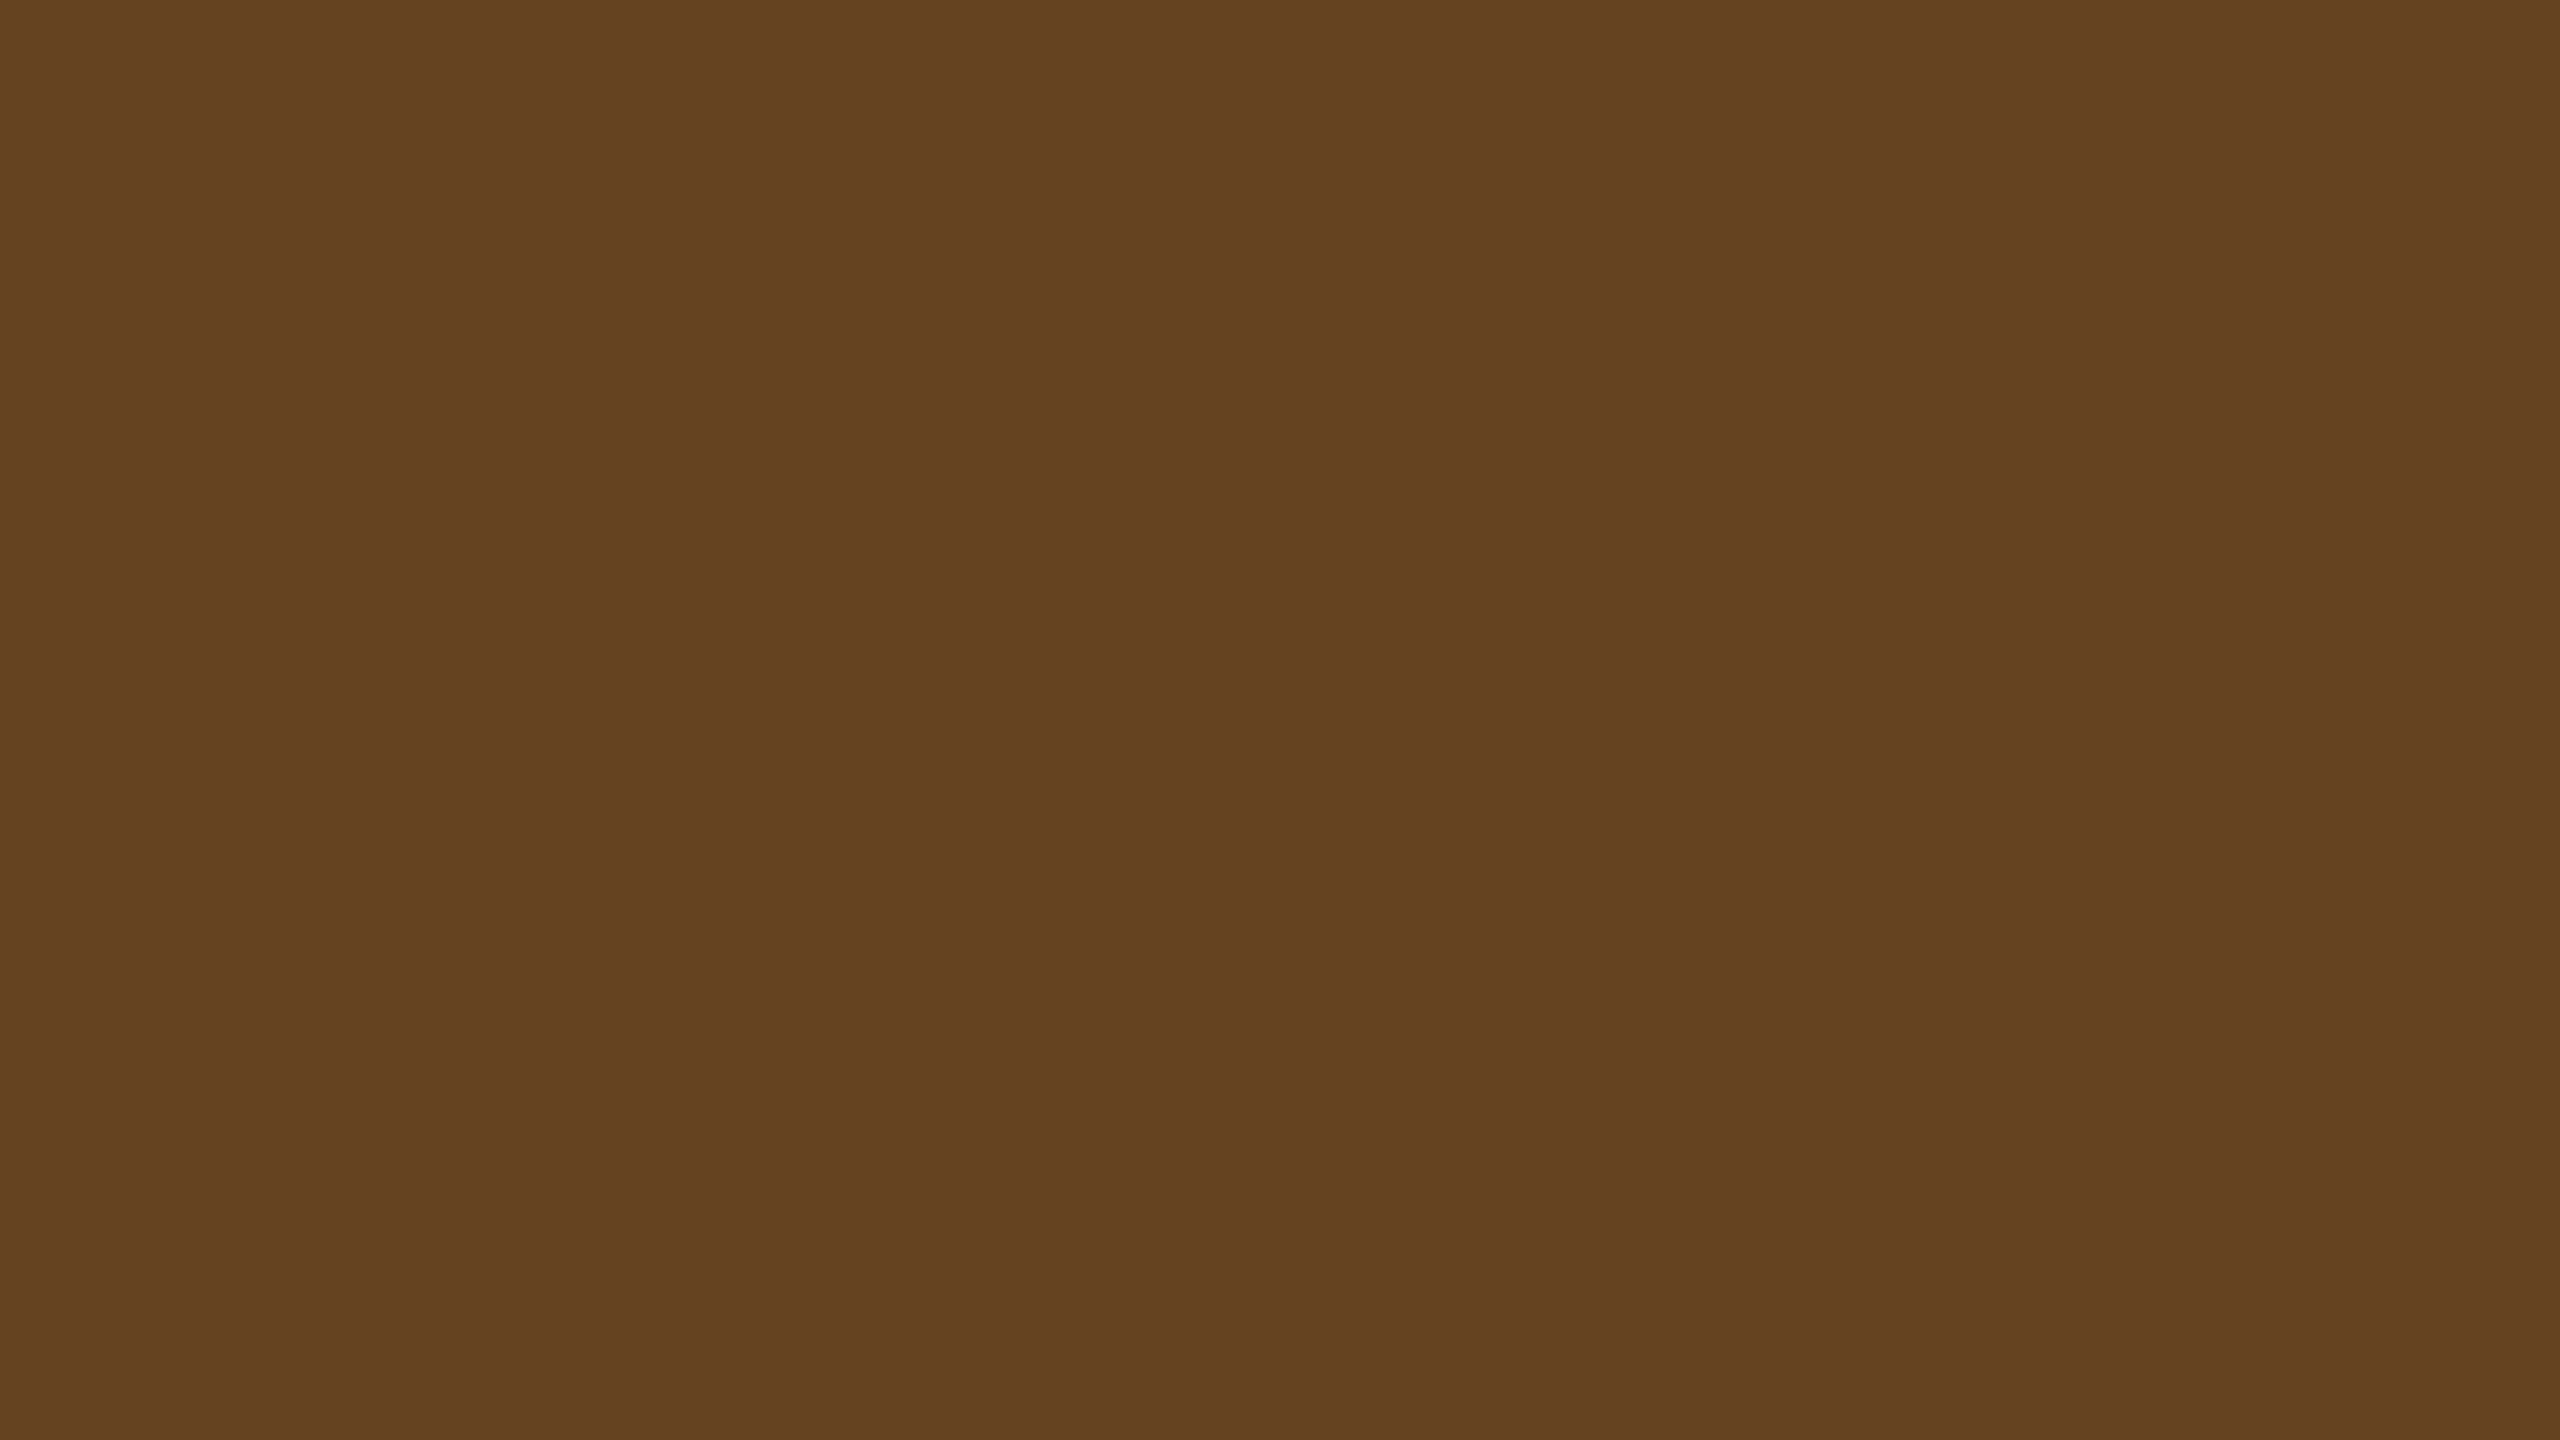 2560x1440 Dark Brown Solid Color Background